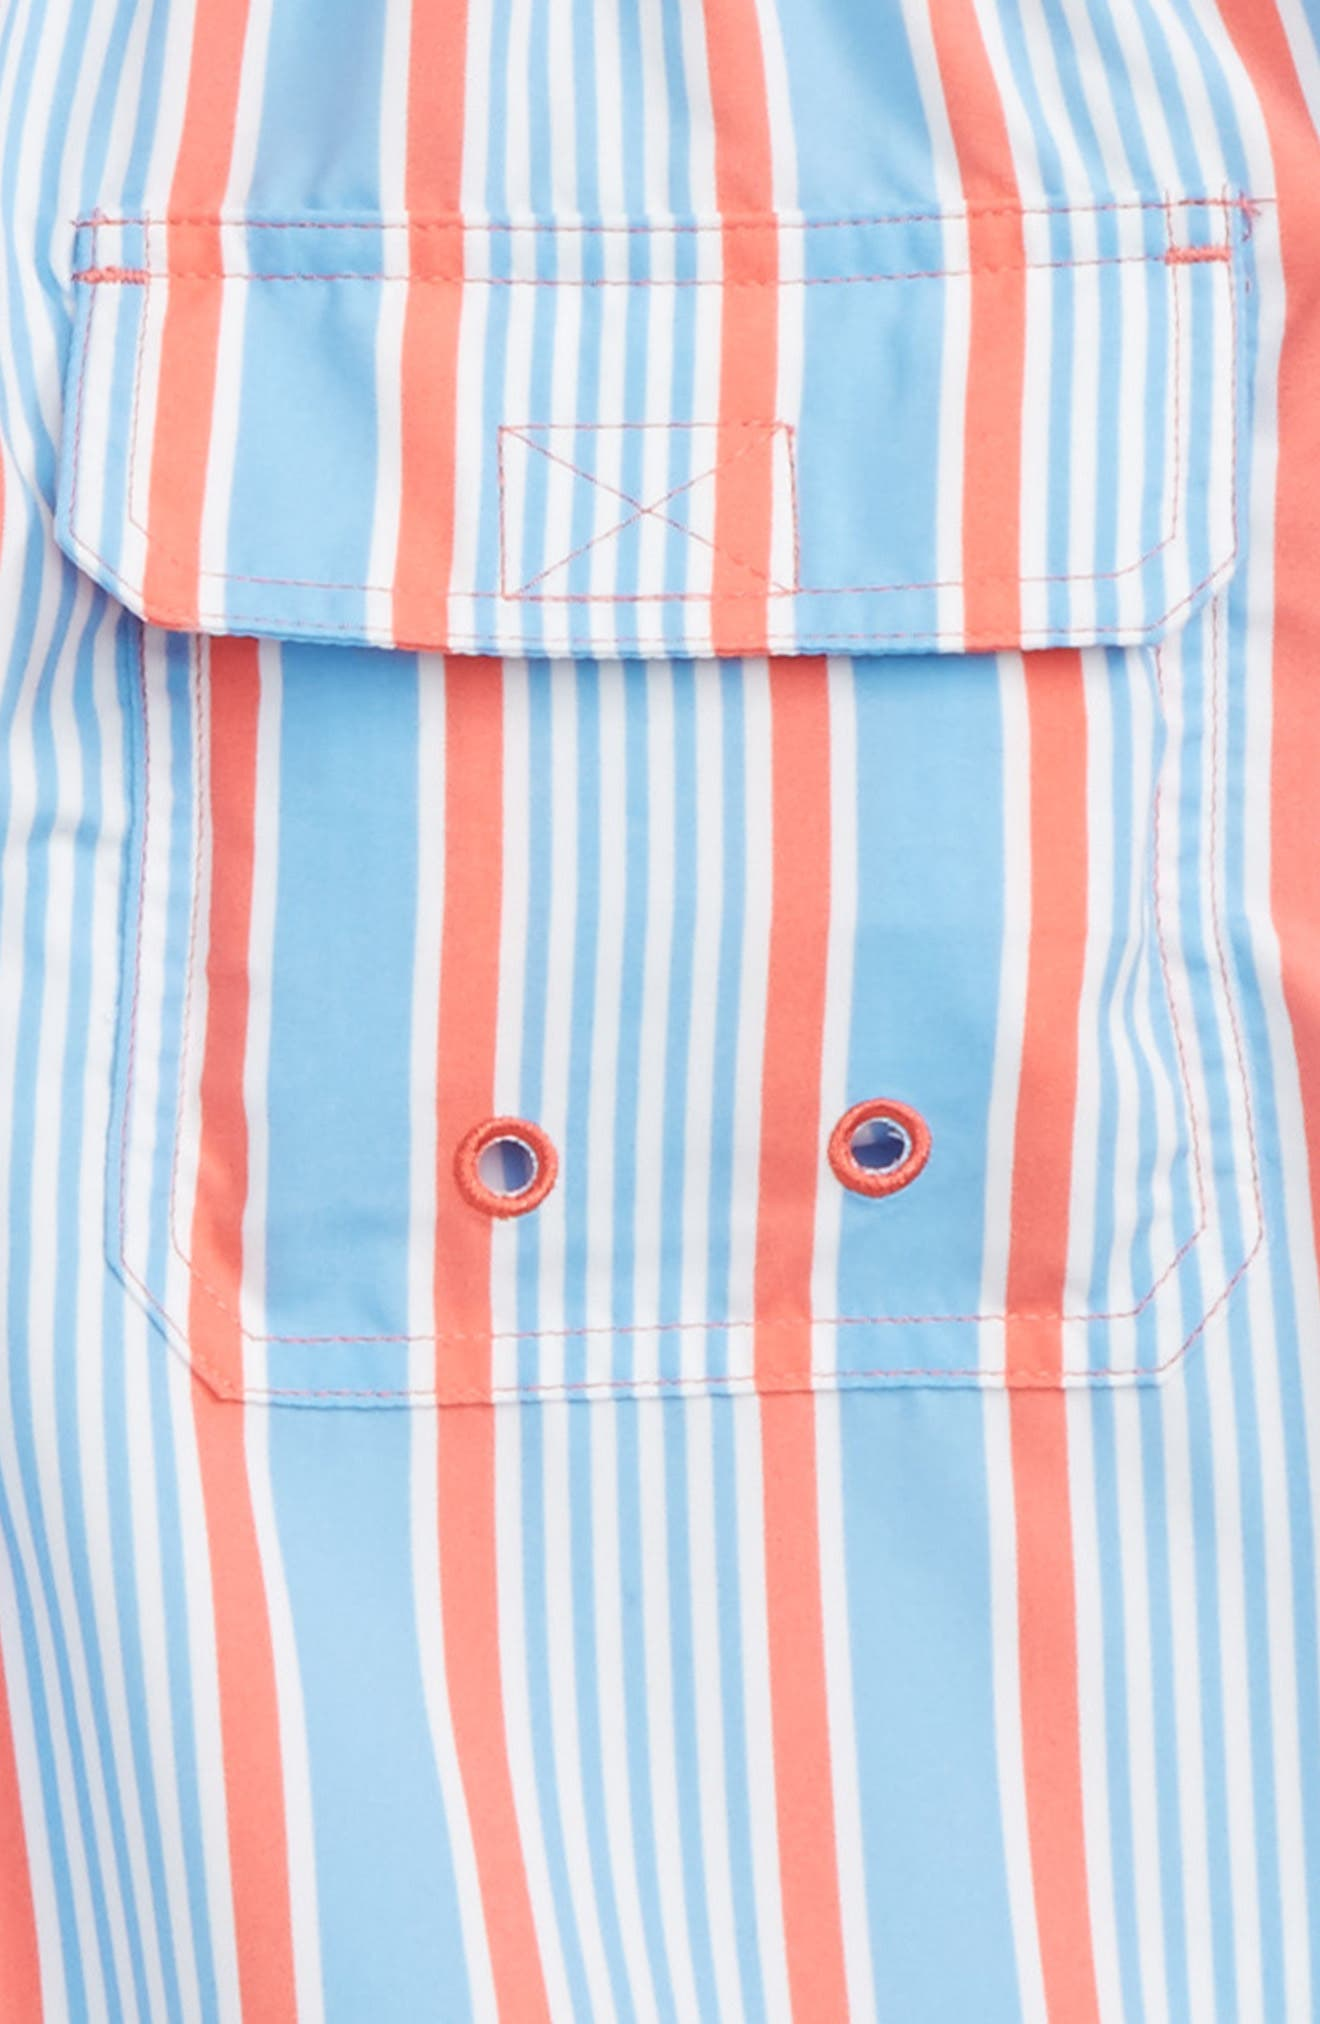 VINEYARD VINES,                             Stripe Bungalow Swim Trunks,                             Alternate thumbnail 2, color,                             669